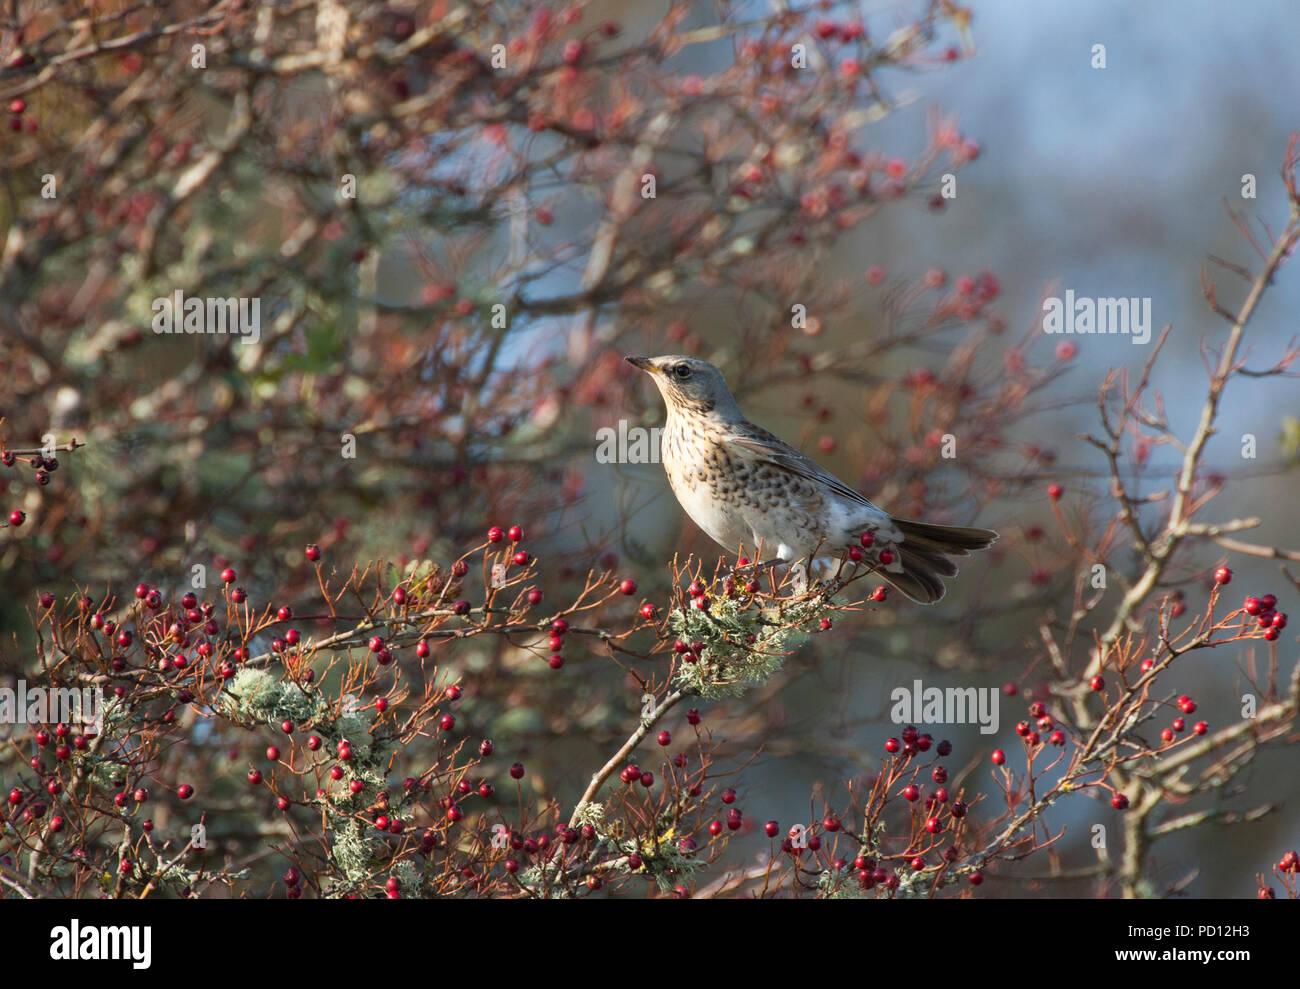 Fieldfare, Turdus pilaris, single adult perching on Hawthorn tree. Taken October. Isle of Islay, Argyll, Scotland, UK. - Stock Image